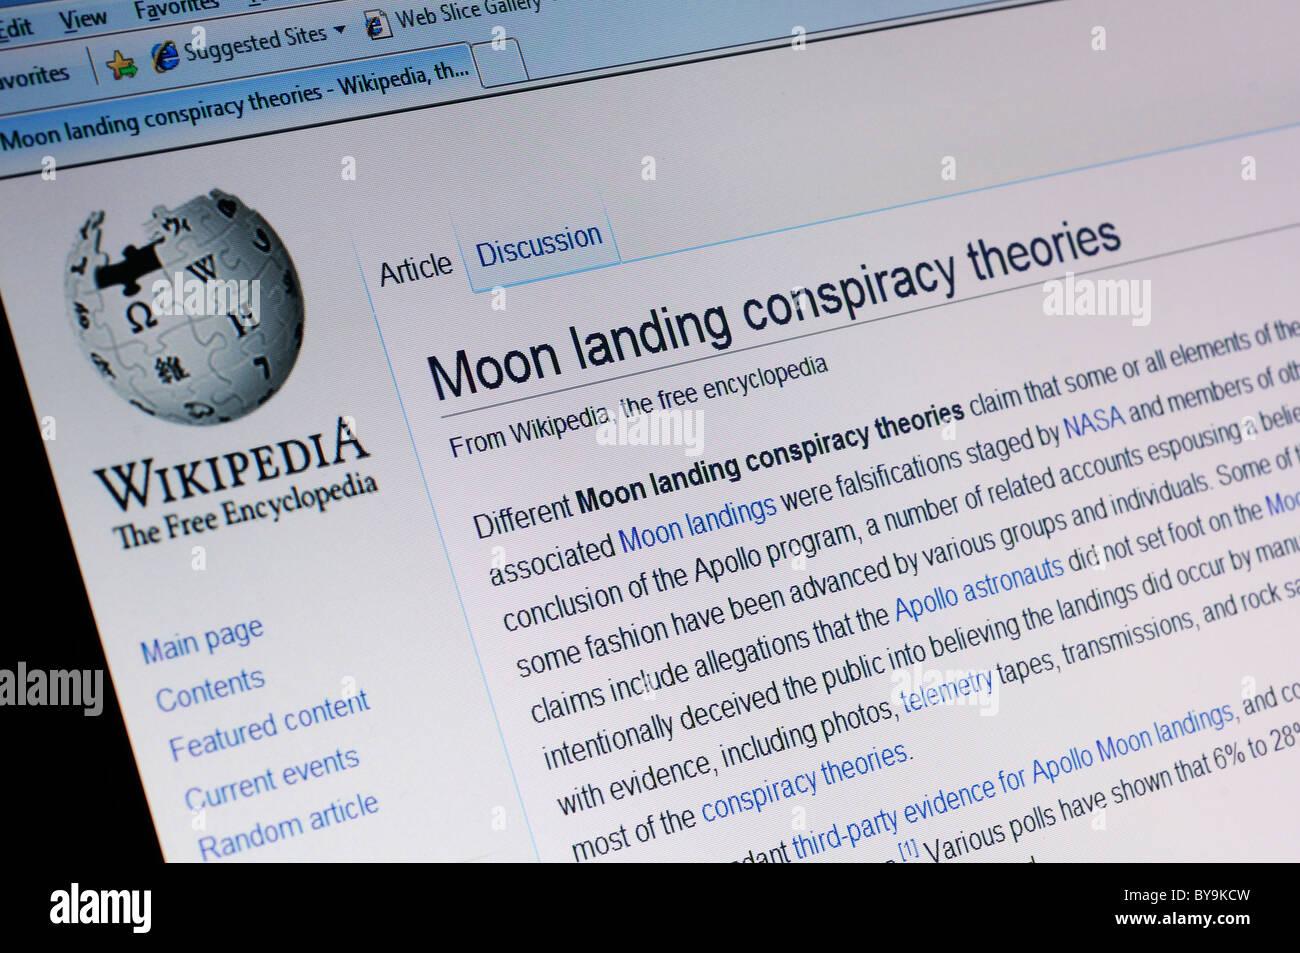 Moon landing conspiracy page on Wikipedia - Stock Image